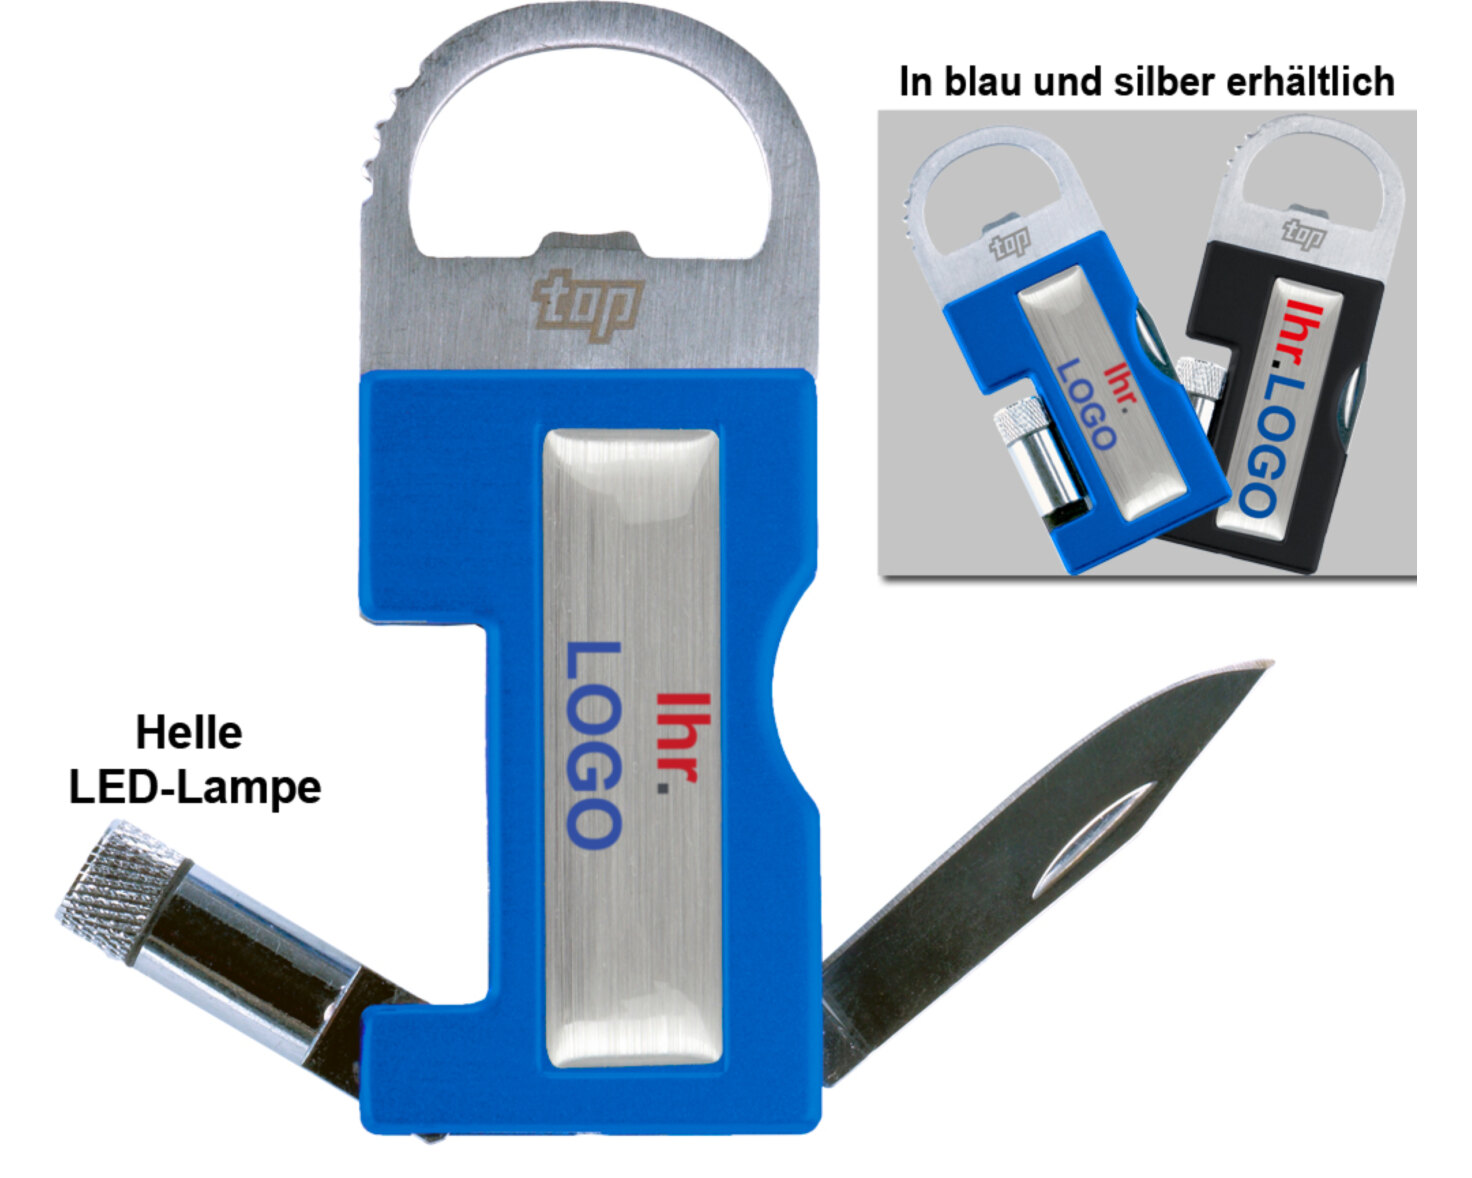 LED-Flaschenöffner Tool als bedrucktes Werbegeschenk